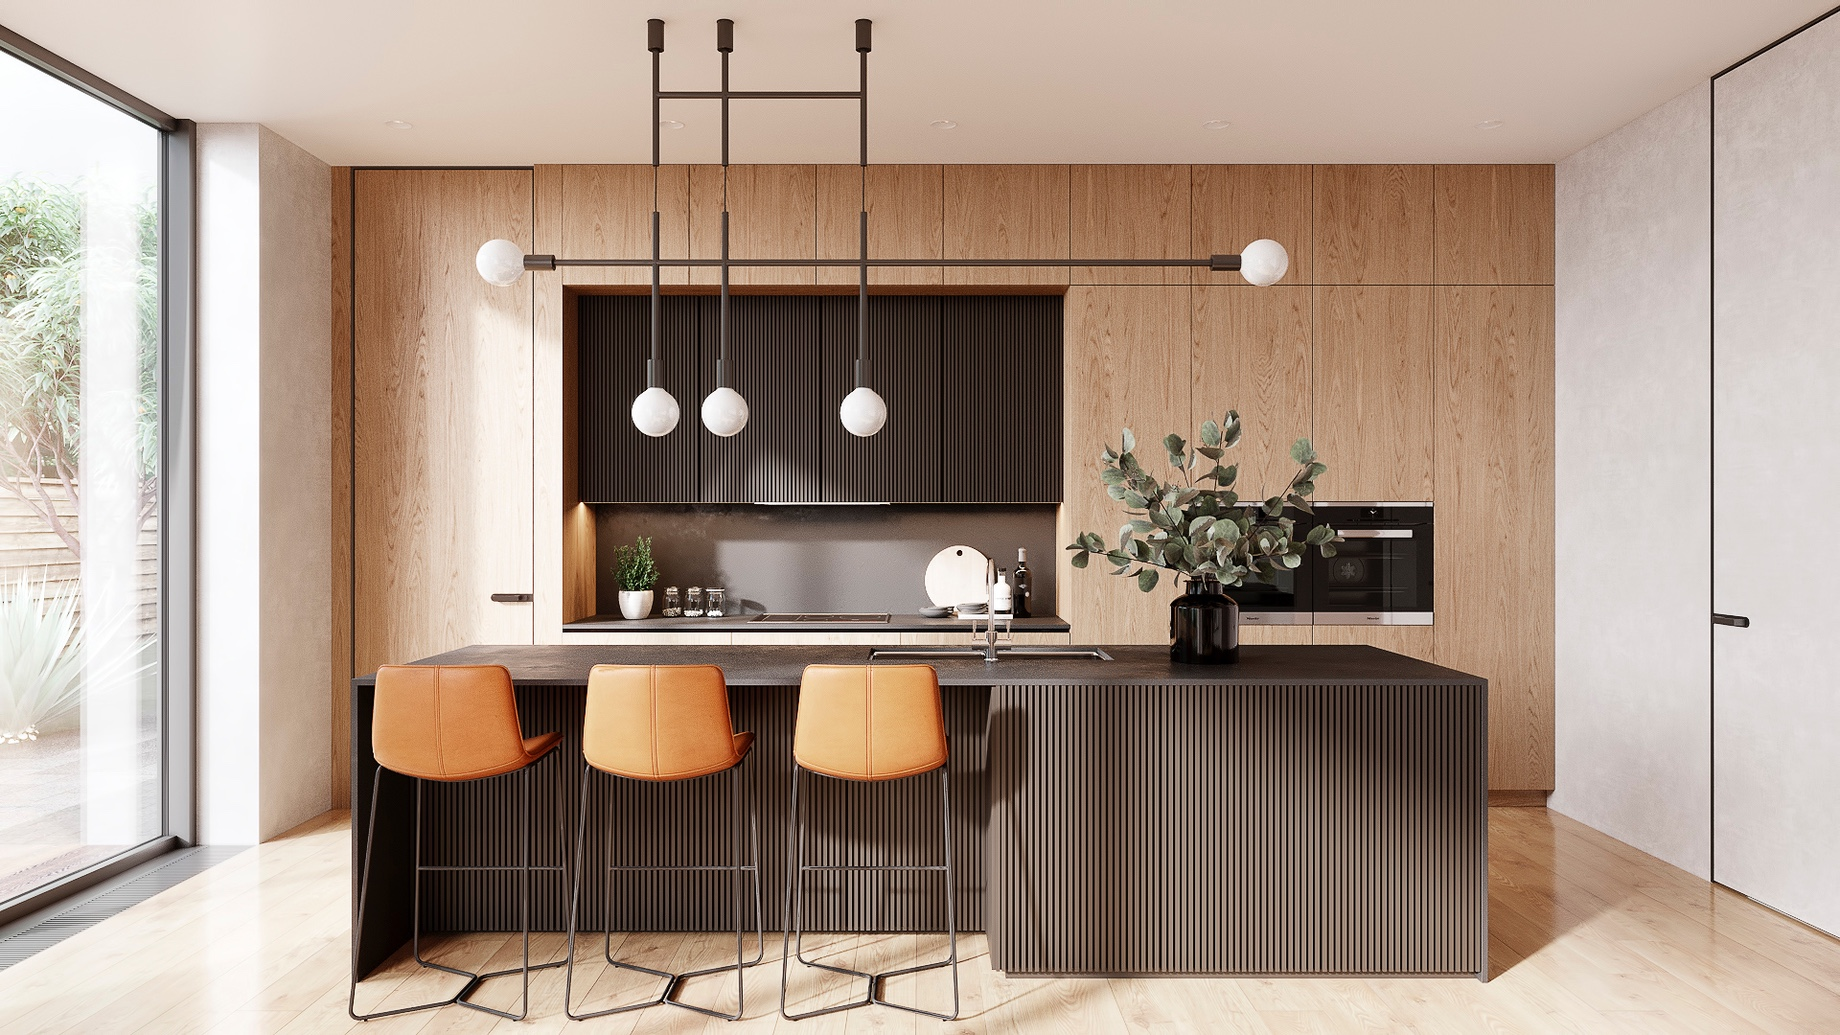 Sleek-Looking Kitchens - Top 6 Interior Design Trends for Luxury Living in California